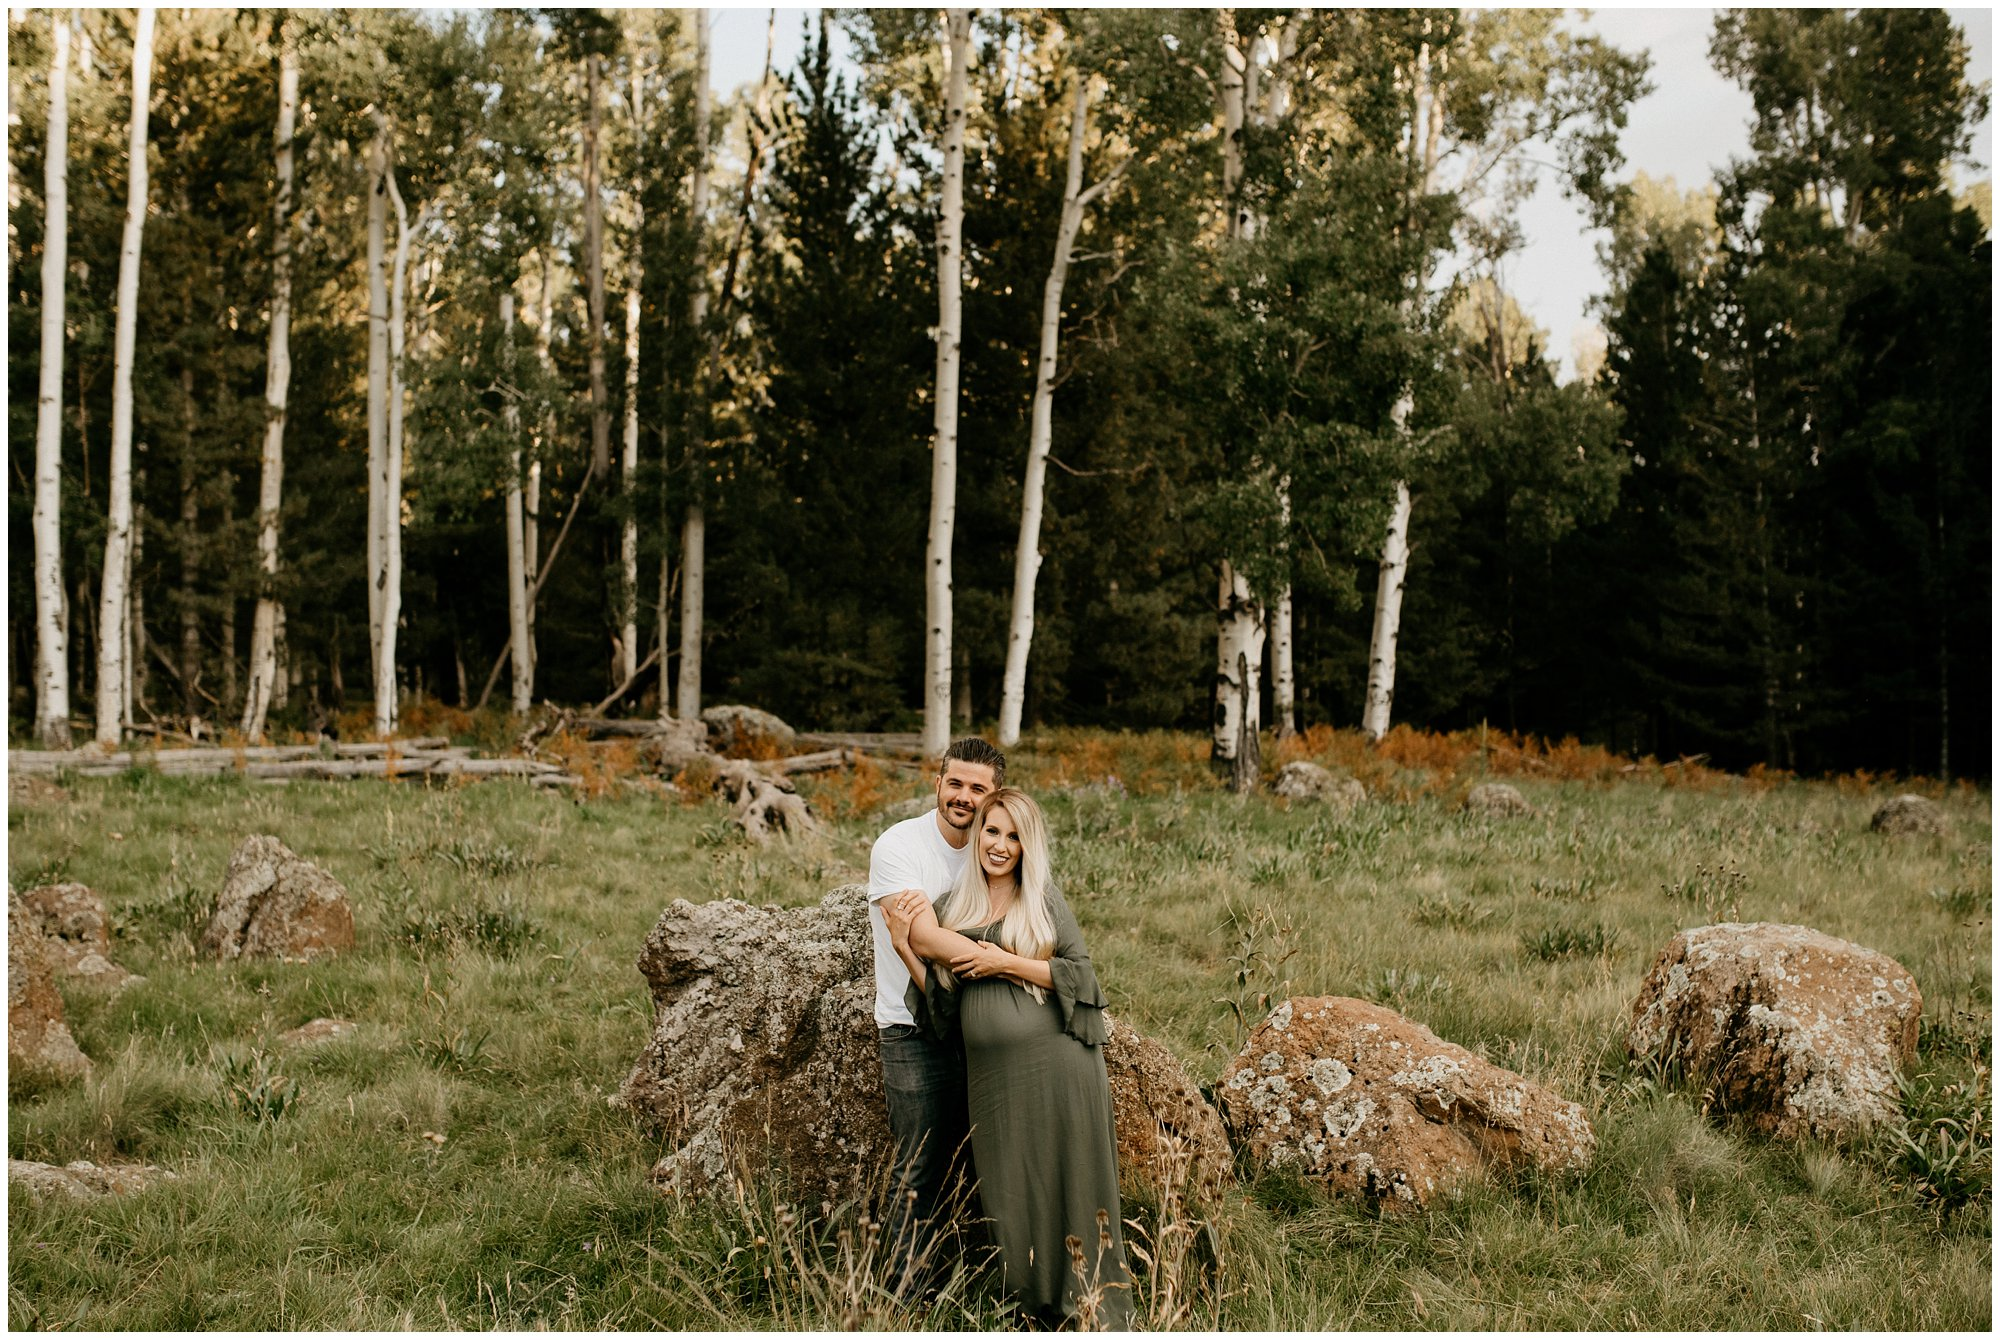 Flagstaff Aspen Tree Portrait Session - Gabby + Gary - Ashtyn Nicole Photo_0037.jpg